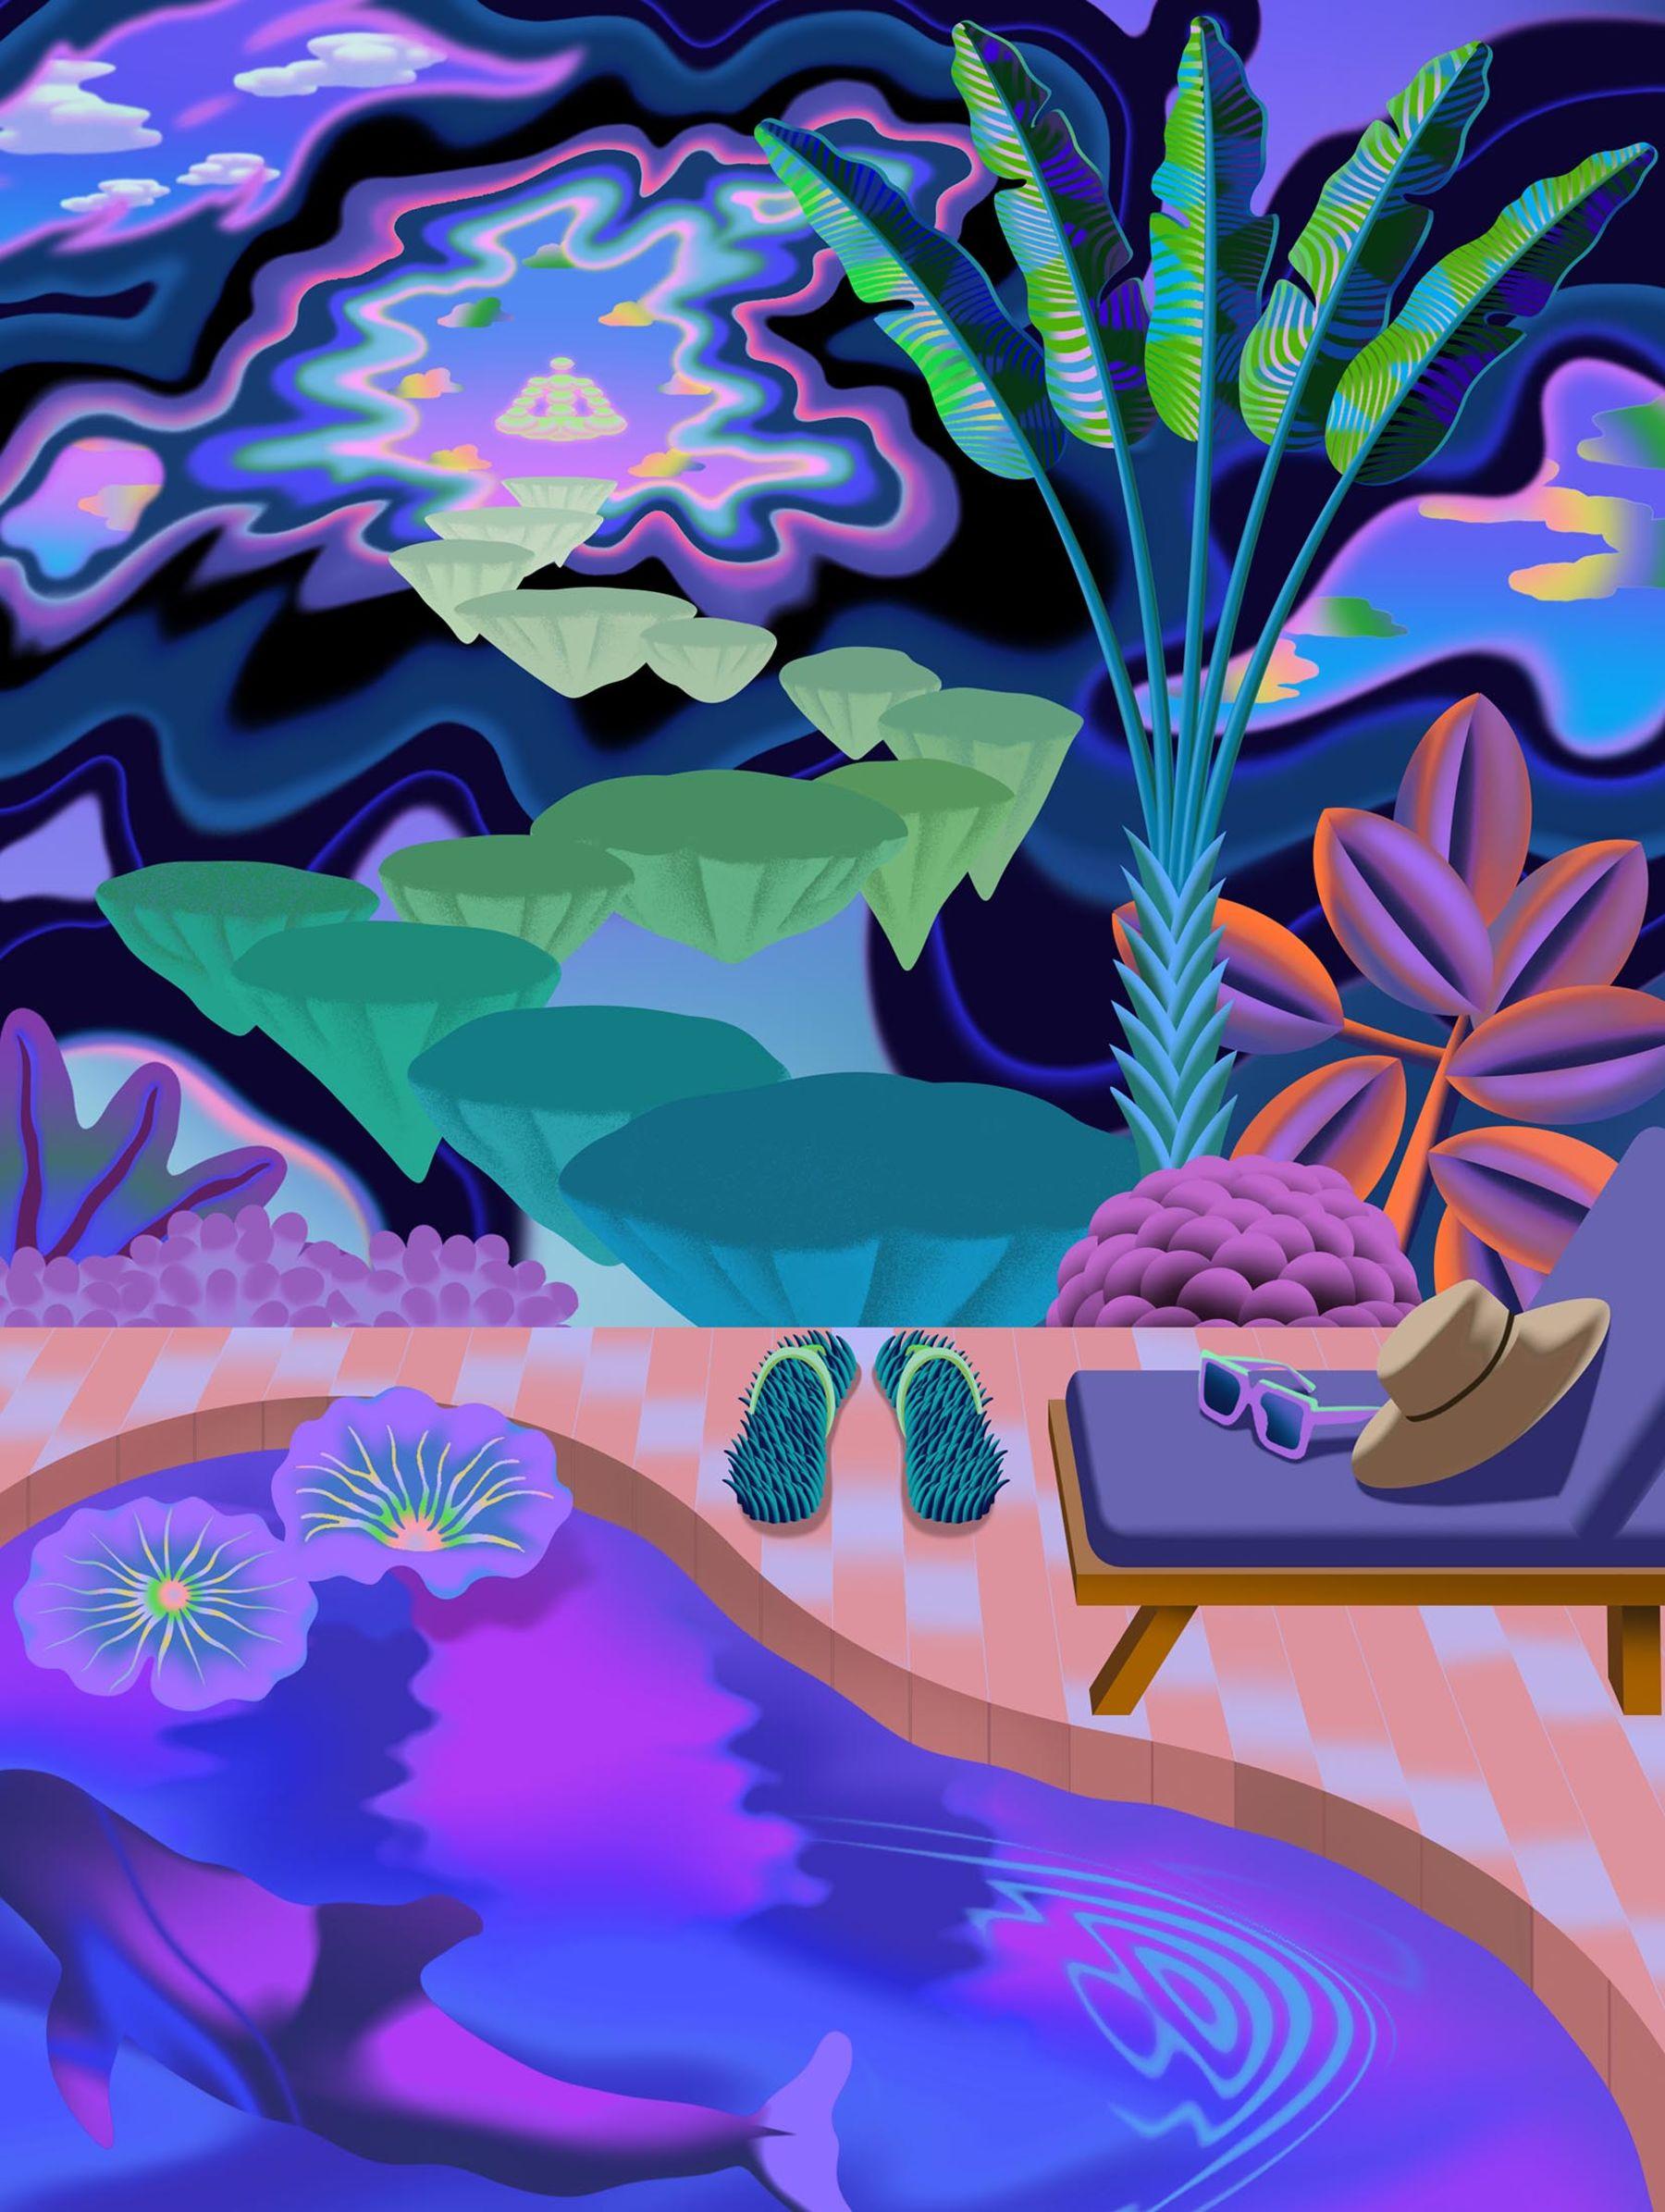 All-Inclusive Magic Mushroom Retreats Are the New Luxury 'Trips'